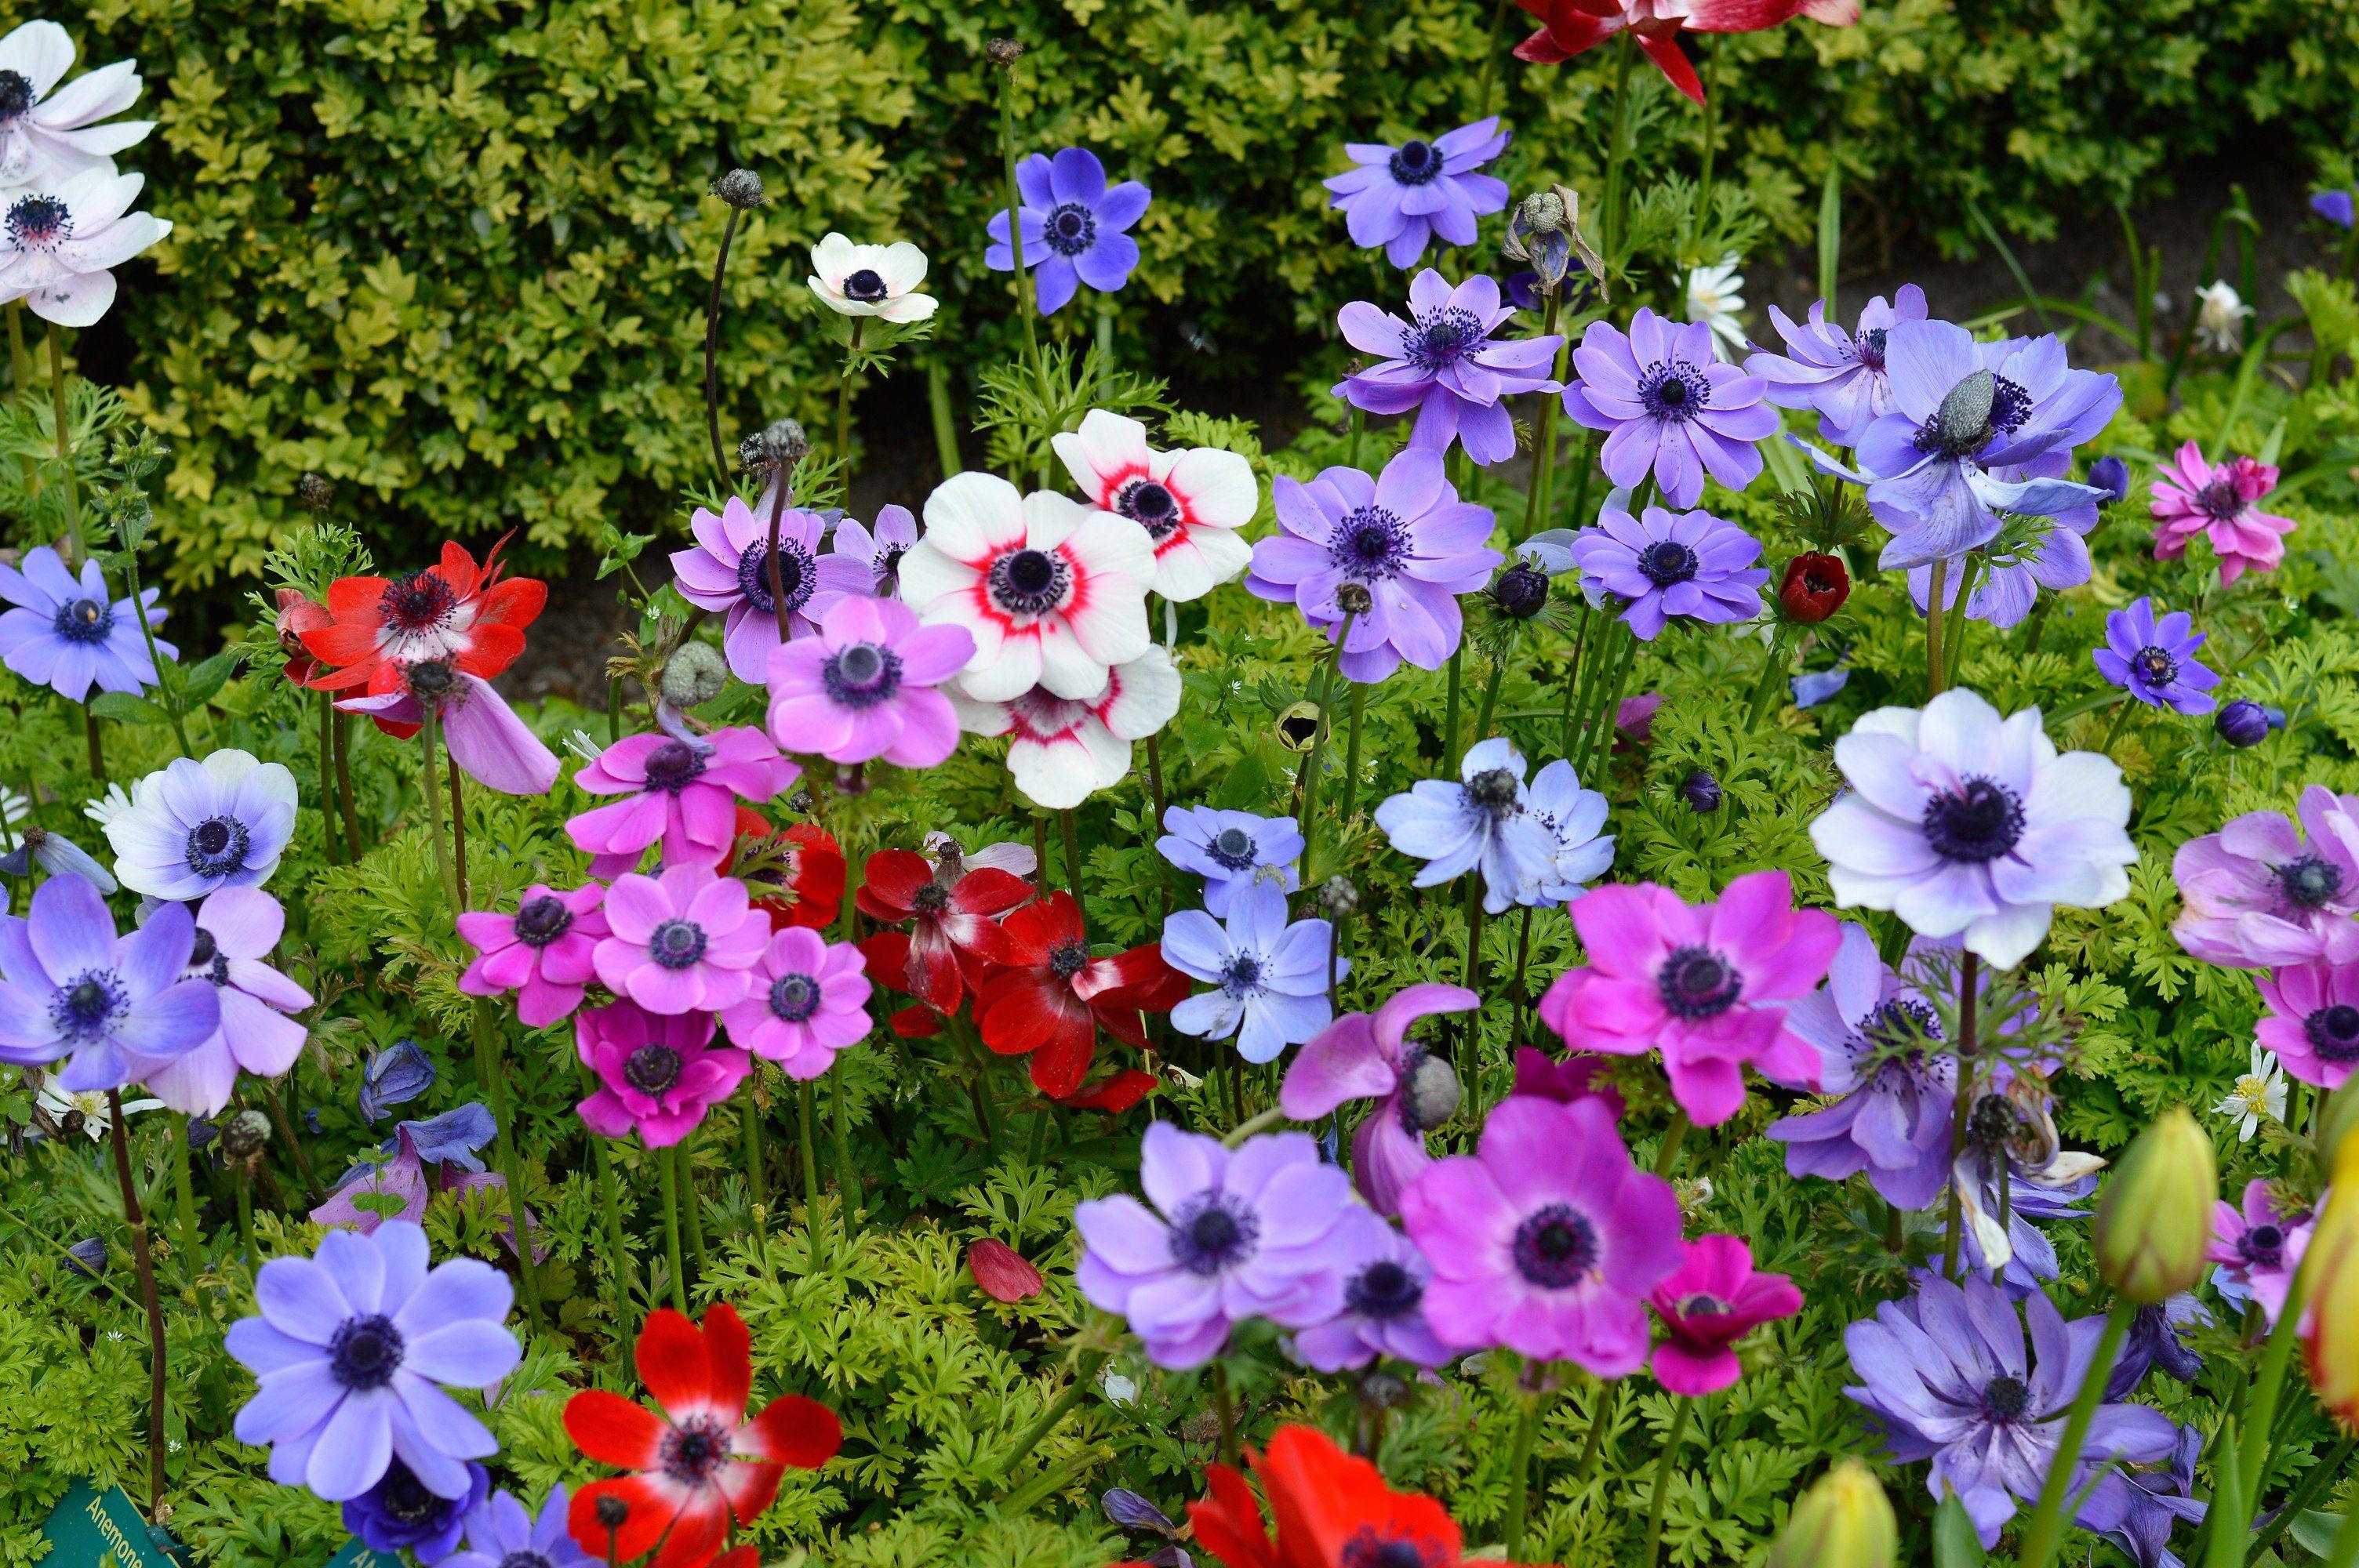 Image Result For Anemone Flower Bulb Flowers Anemone Flower Plant Flower Bulbs